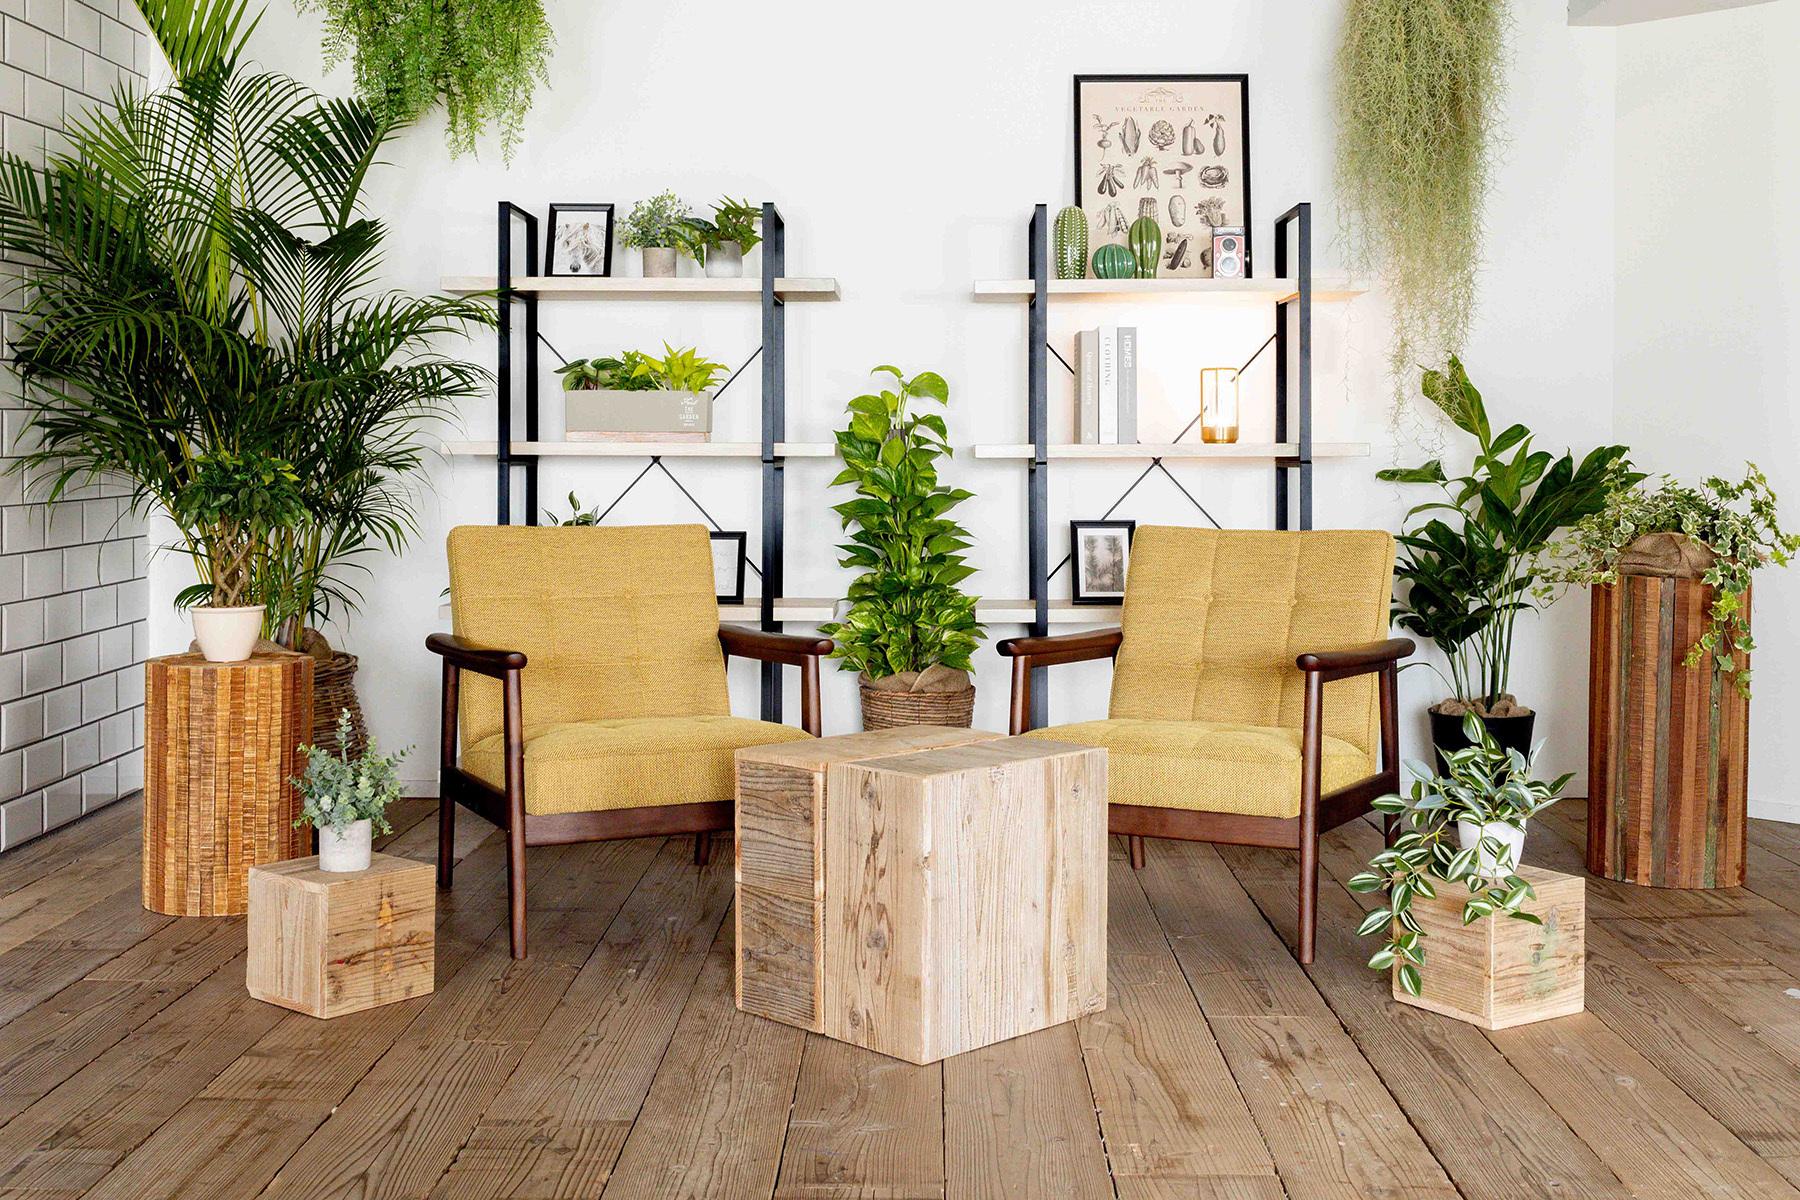 STUDIO FOXTAIL Bst (スタジオ フォックステイル Bst)天候を気にせず窓裏照明が可能